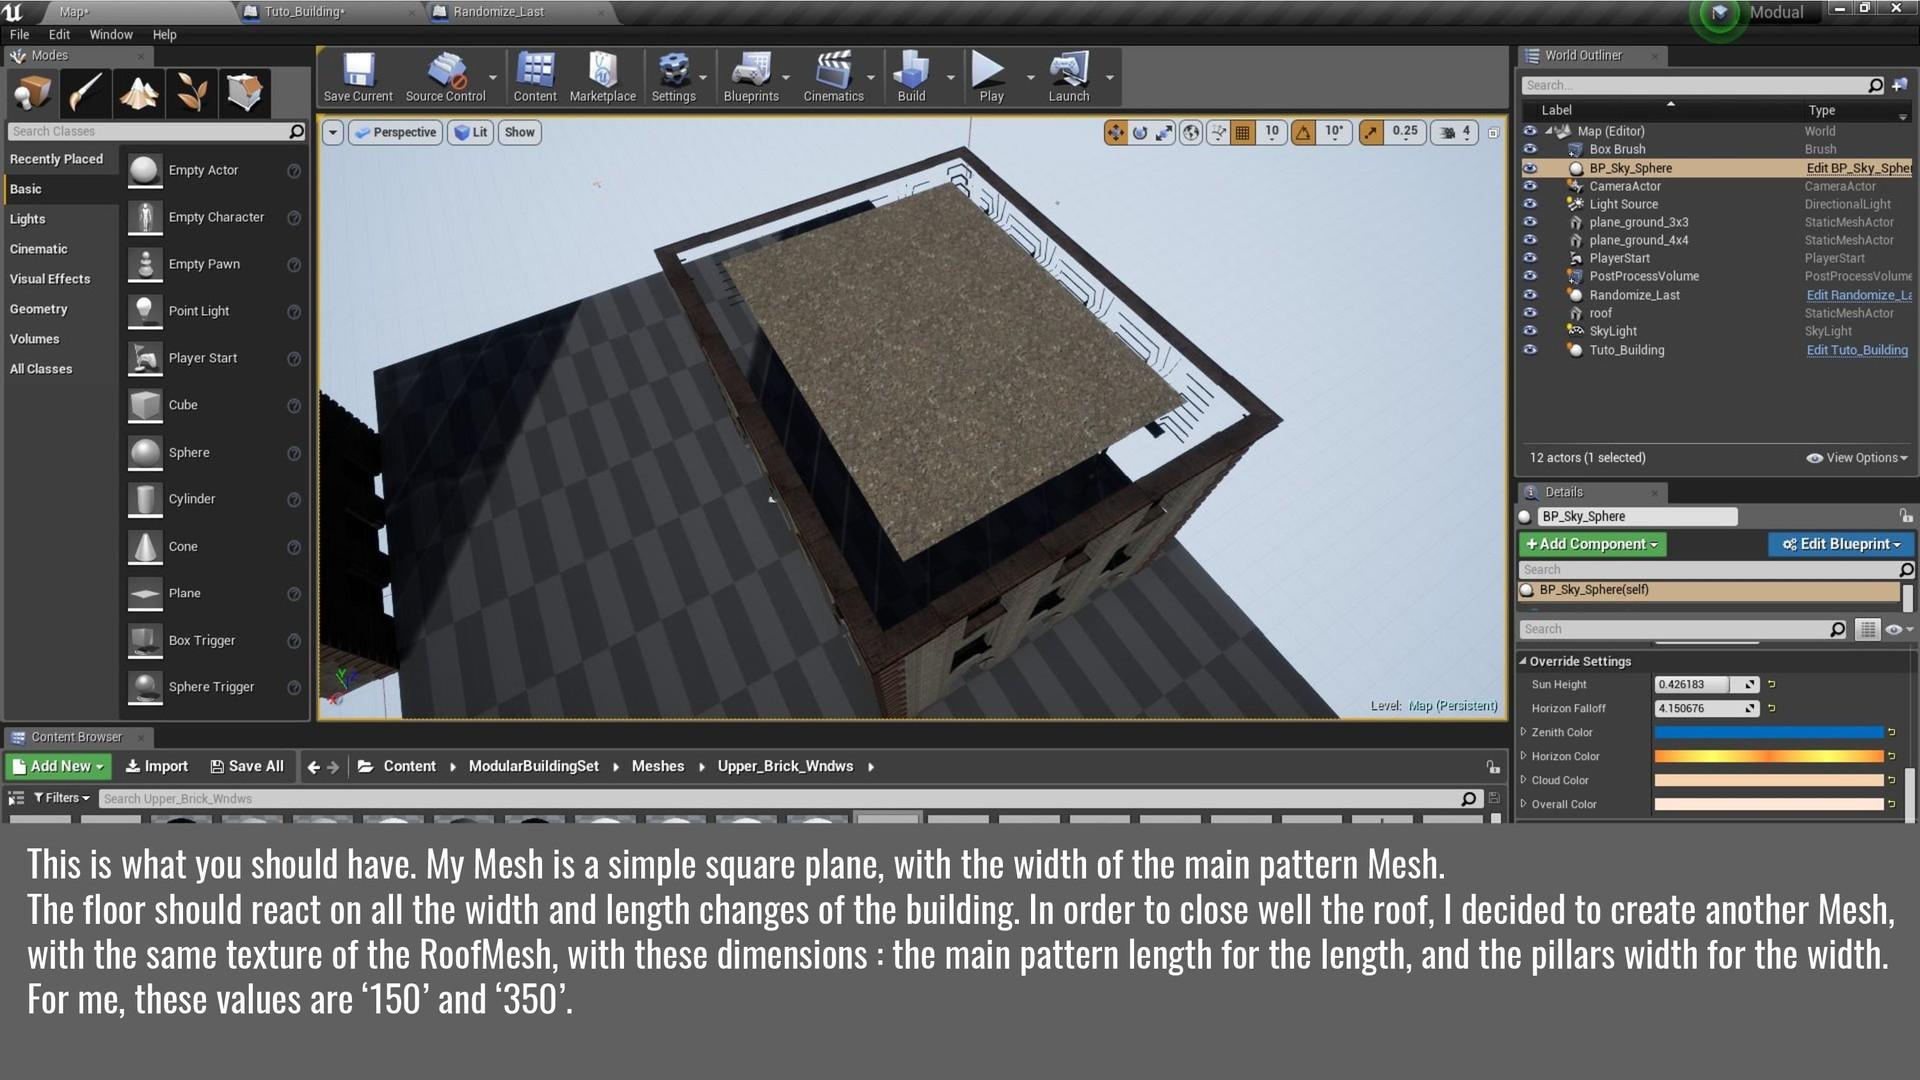 Jordan jaminet tuto building 1 page 046